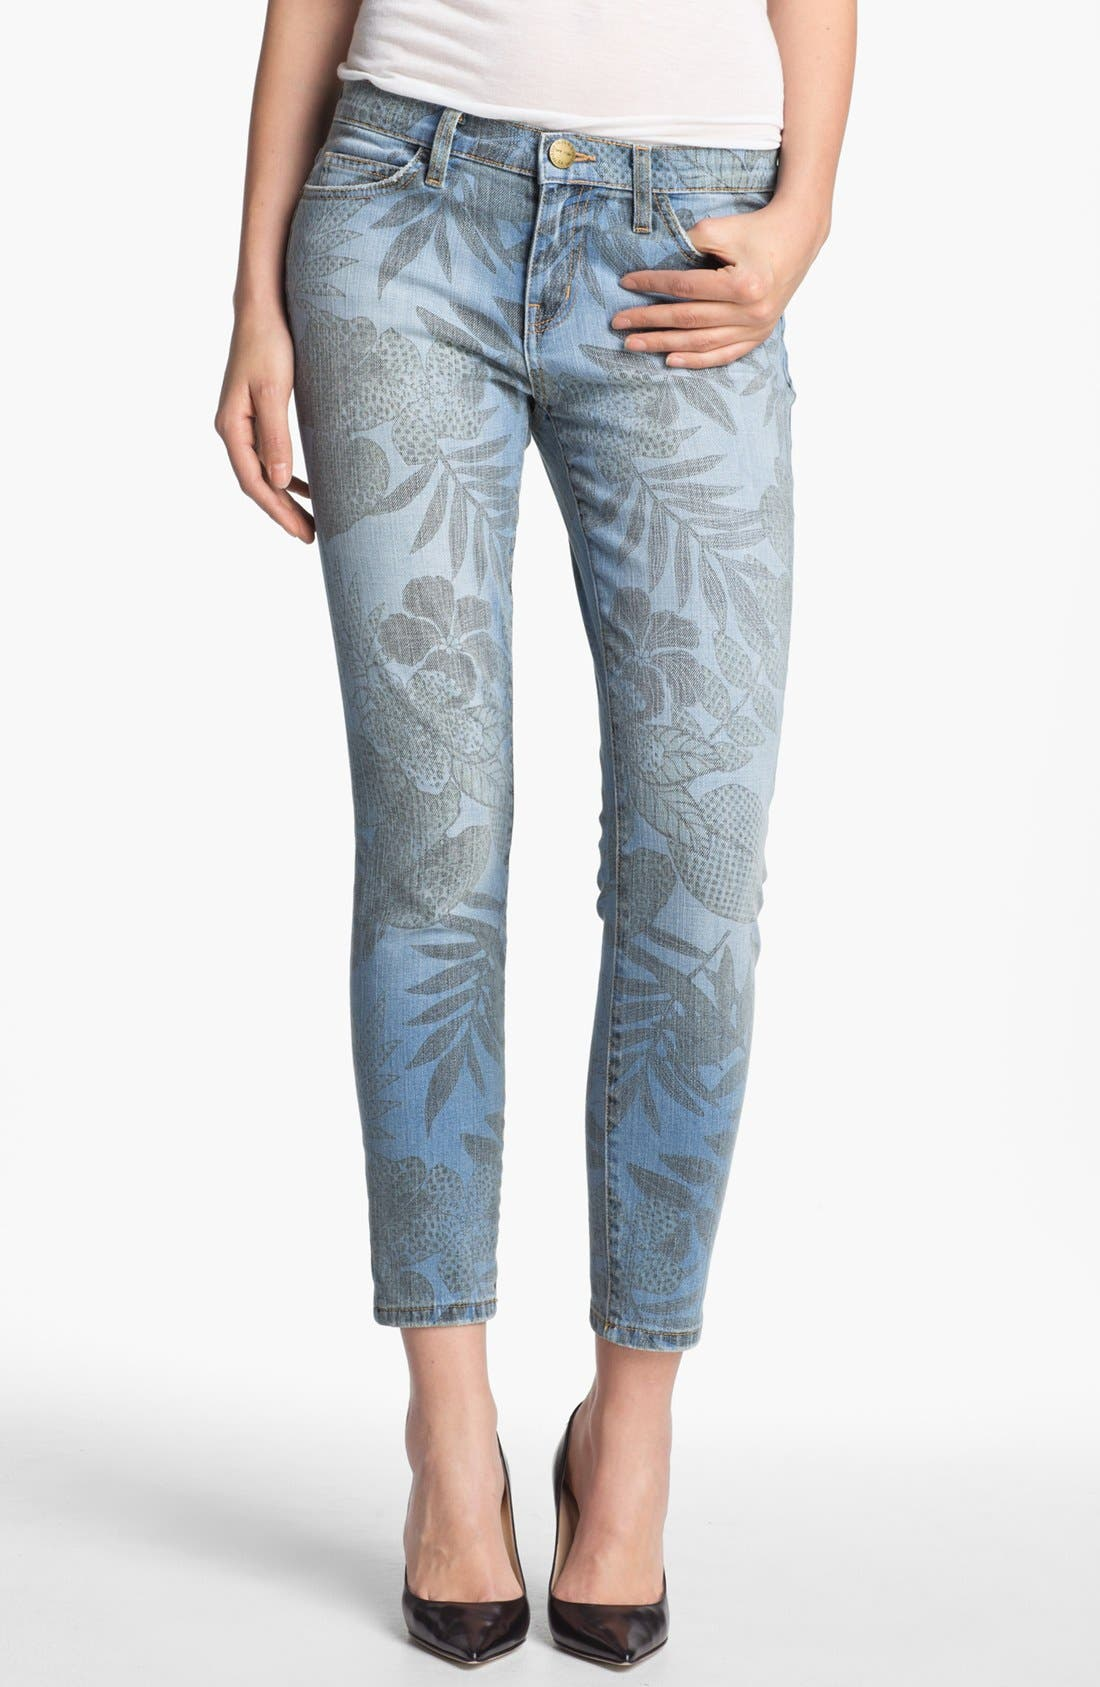 Alternate Image 1 Selected - Current/Elliott 'The Stiletto' Jungle Print Stretch Jeans